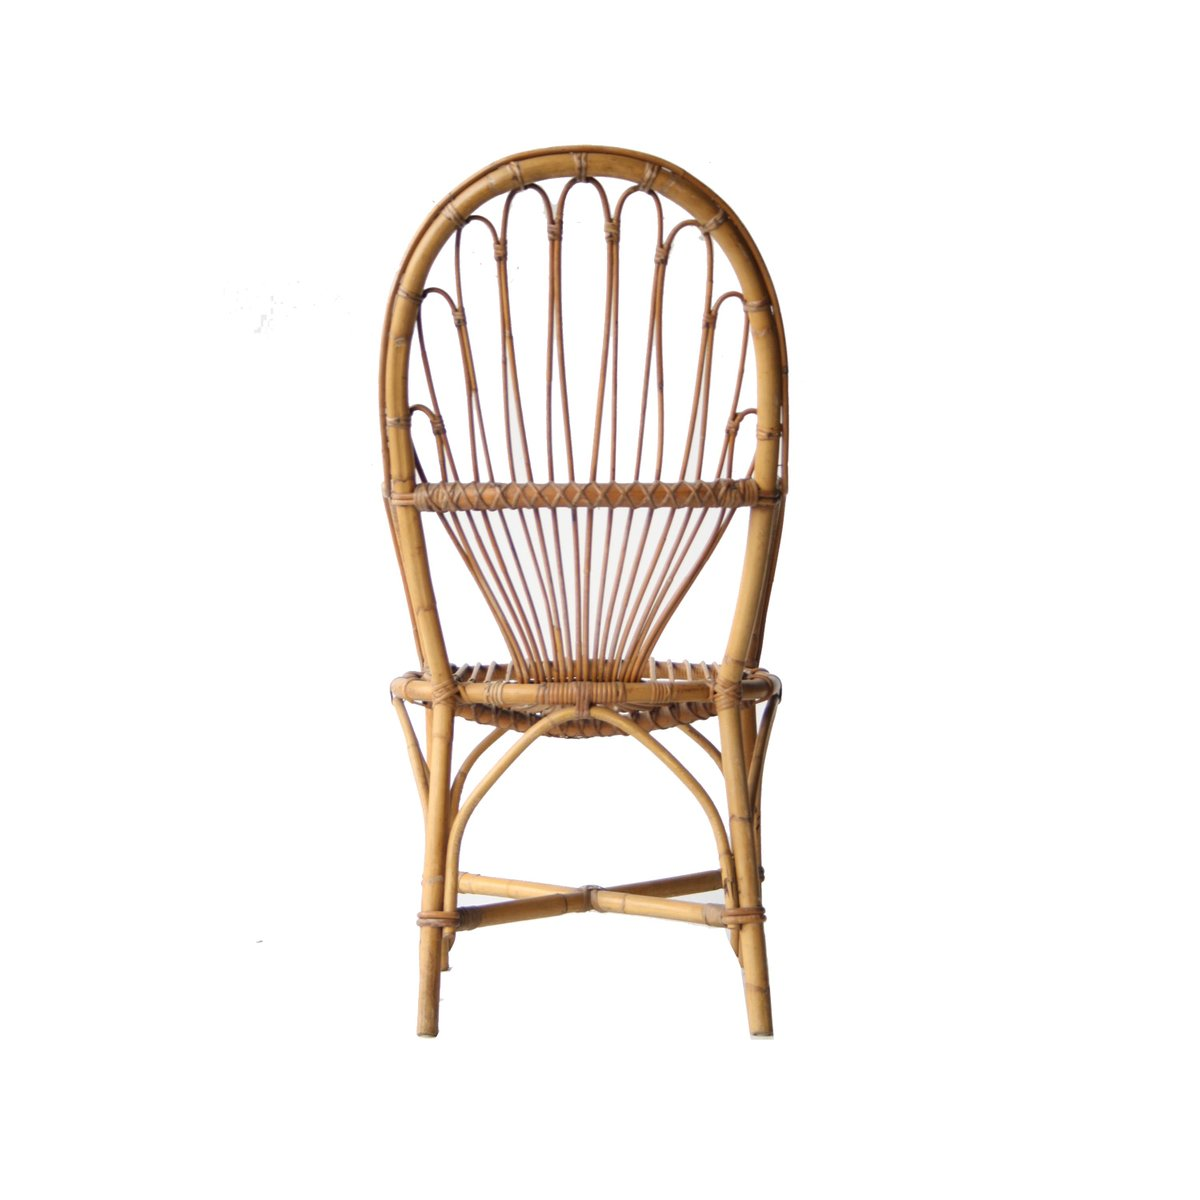 fauteuil vintage bambou france en vente sur pamono. Black Bedroom Furniture Sets. Home Design Ideas